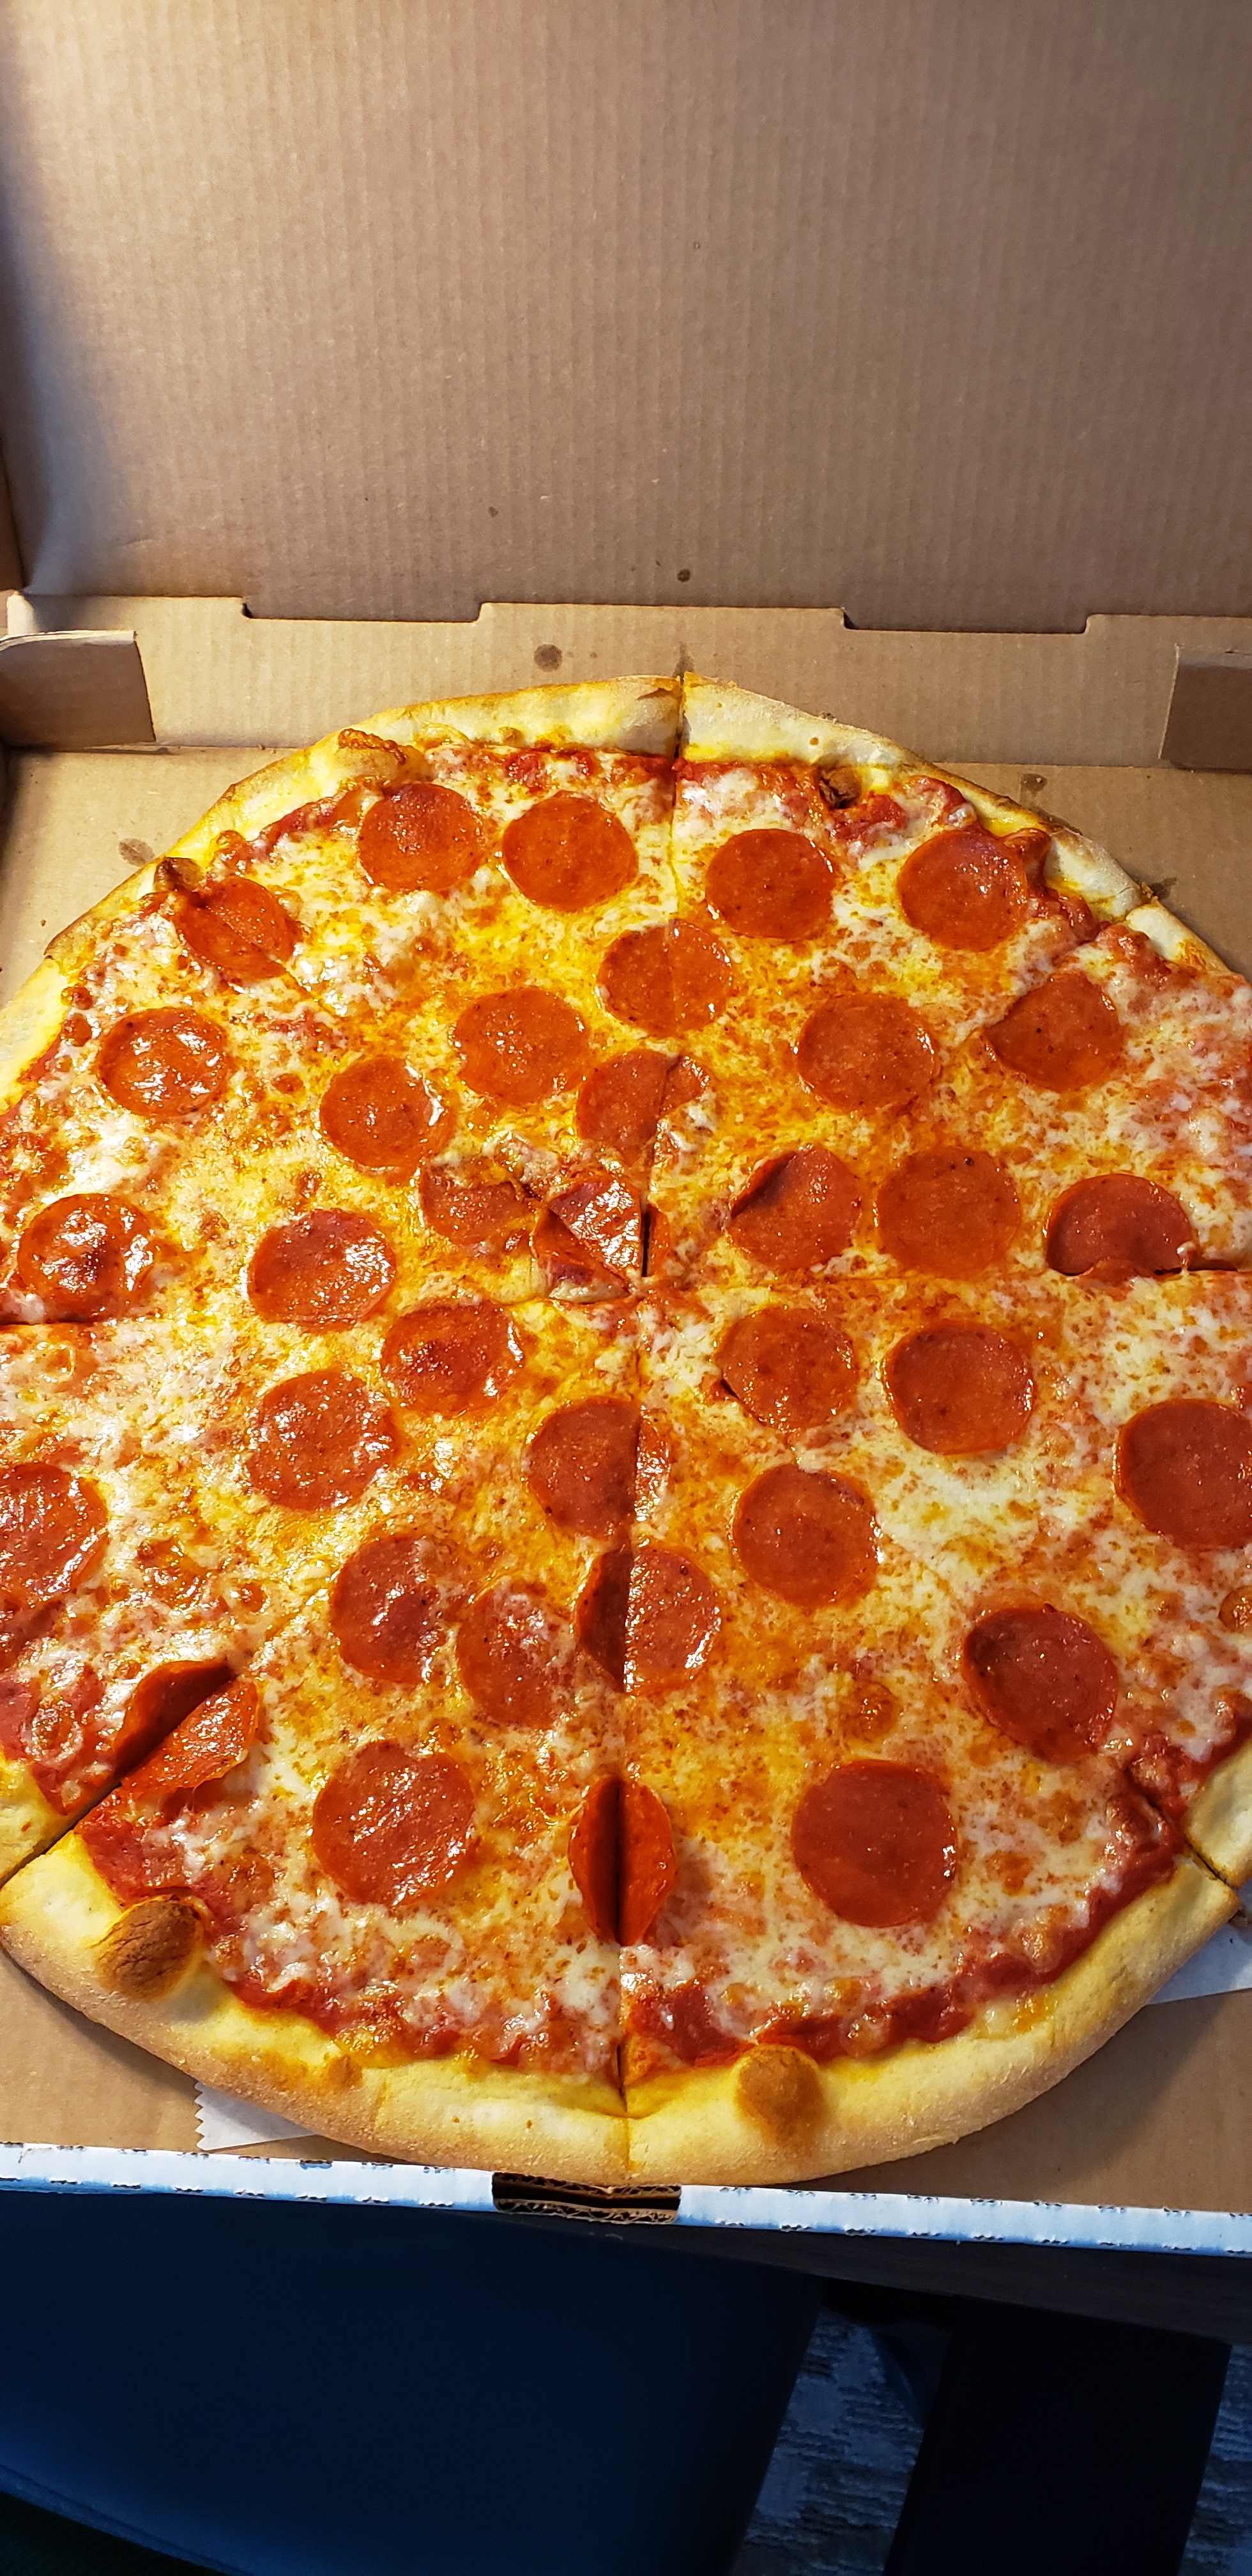 brien.byrne on One Bite Pizza App